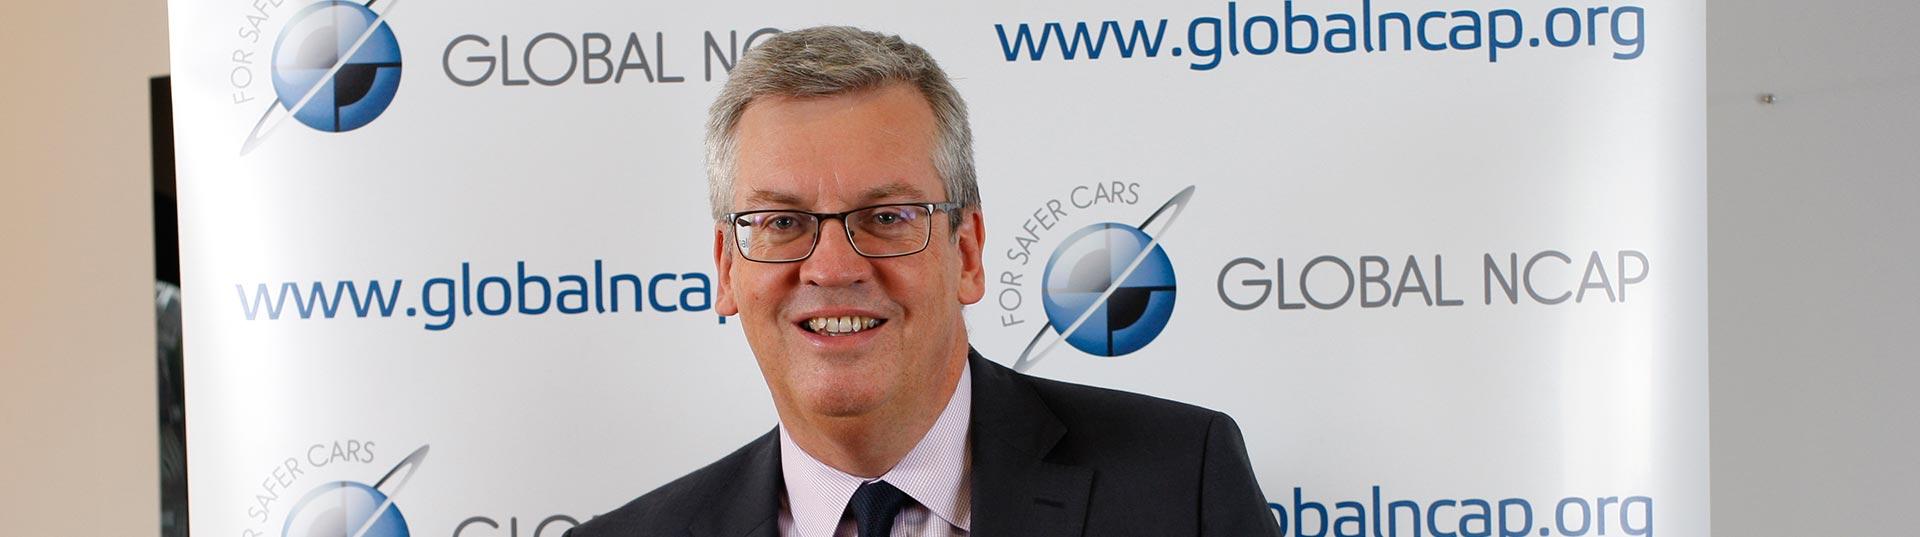 David Ward, Global Ncap